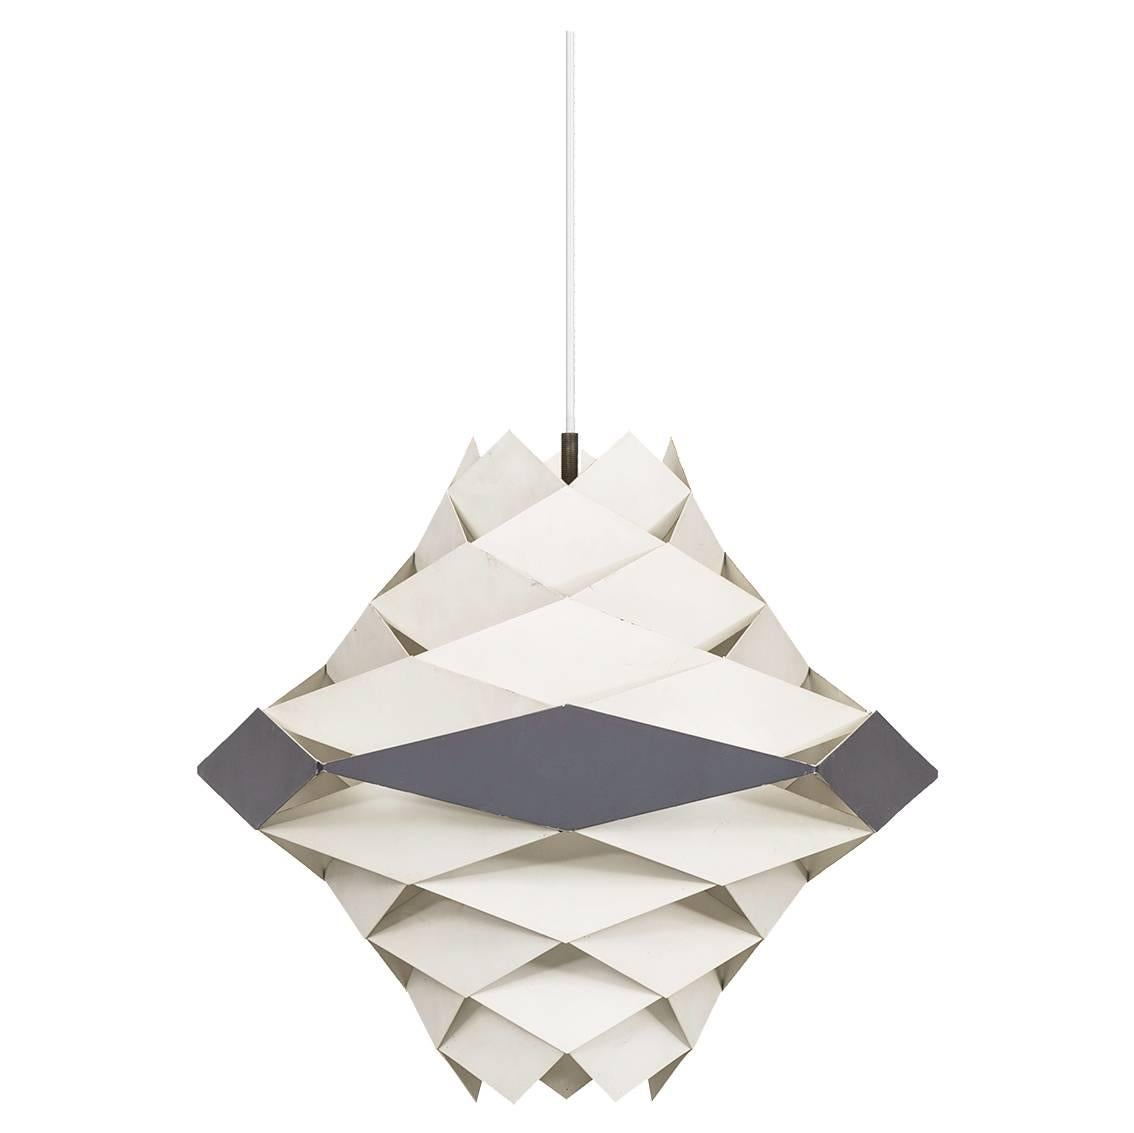 Preben Dahl Ceiling Lamp Model Symfoni by Hans Følsgaard A/S in Denmark